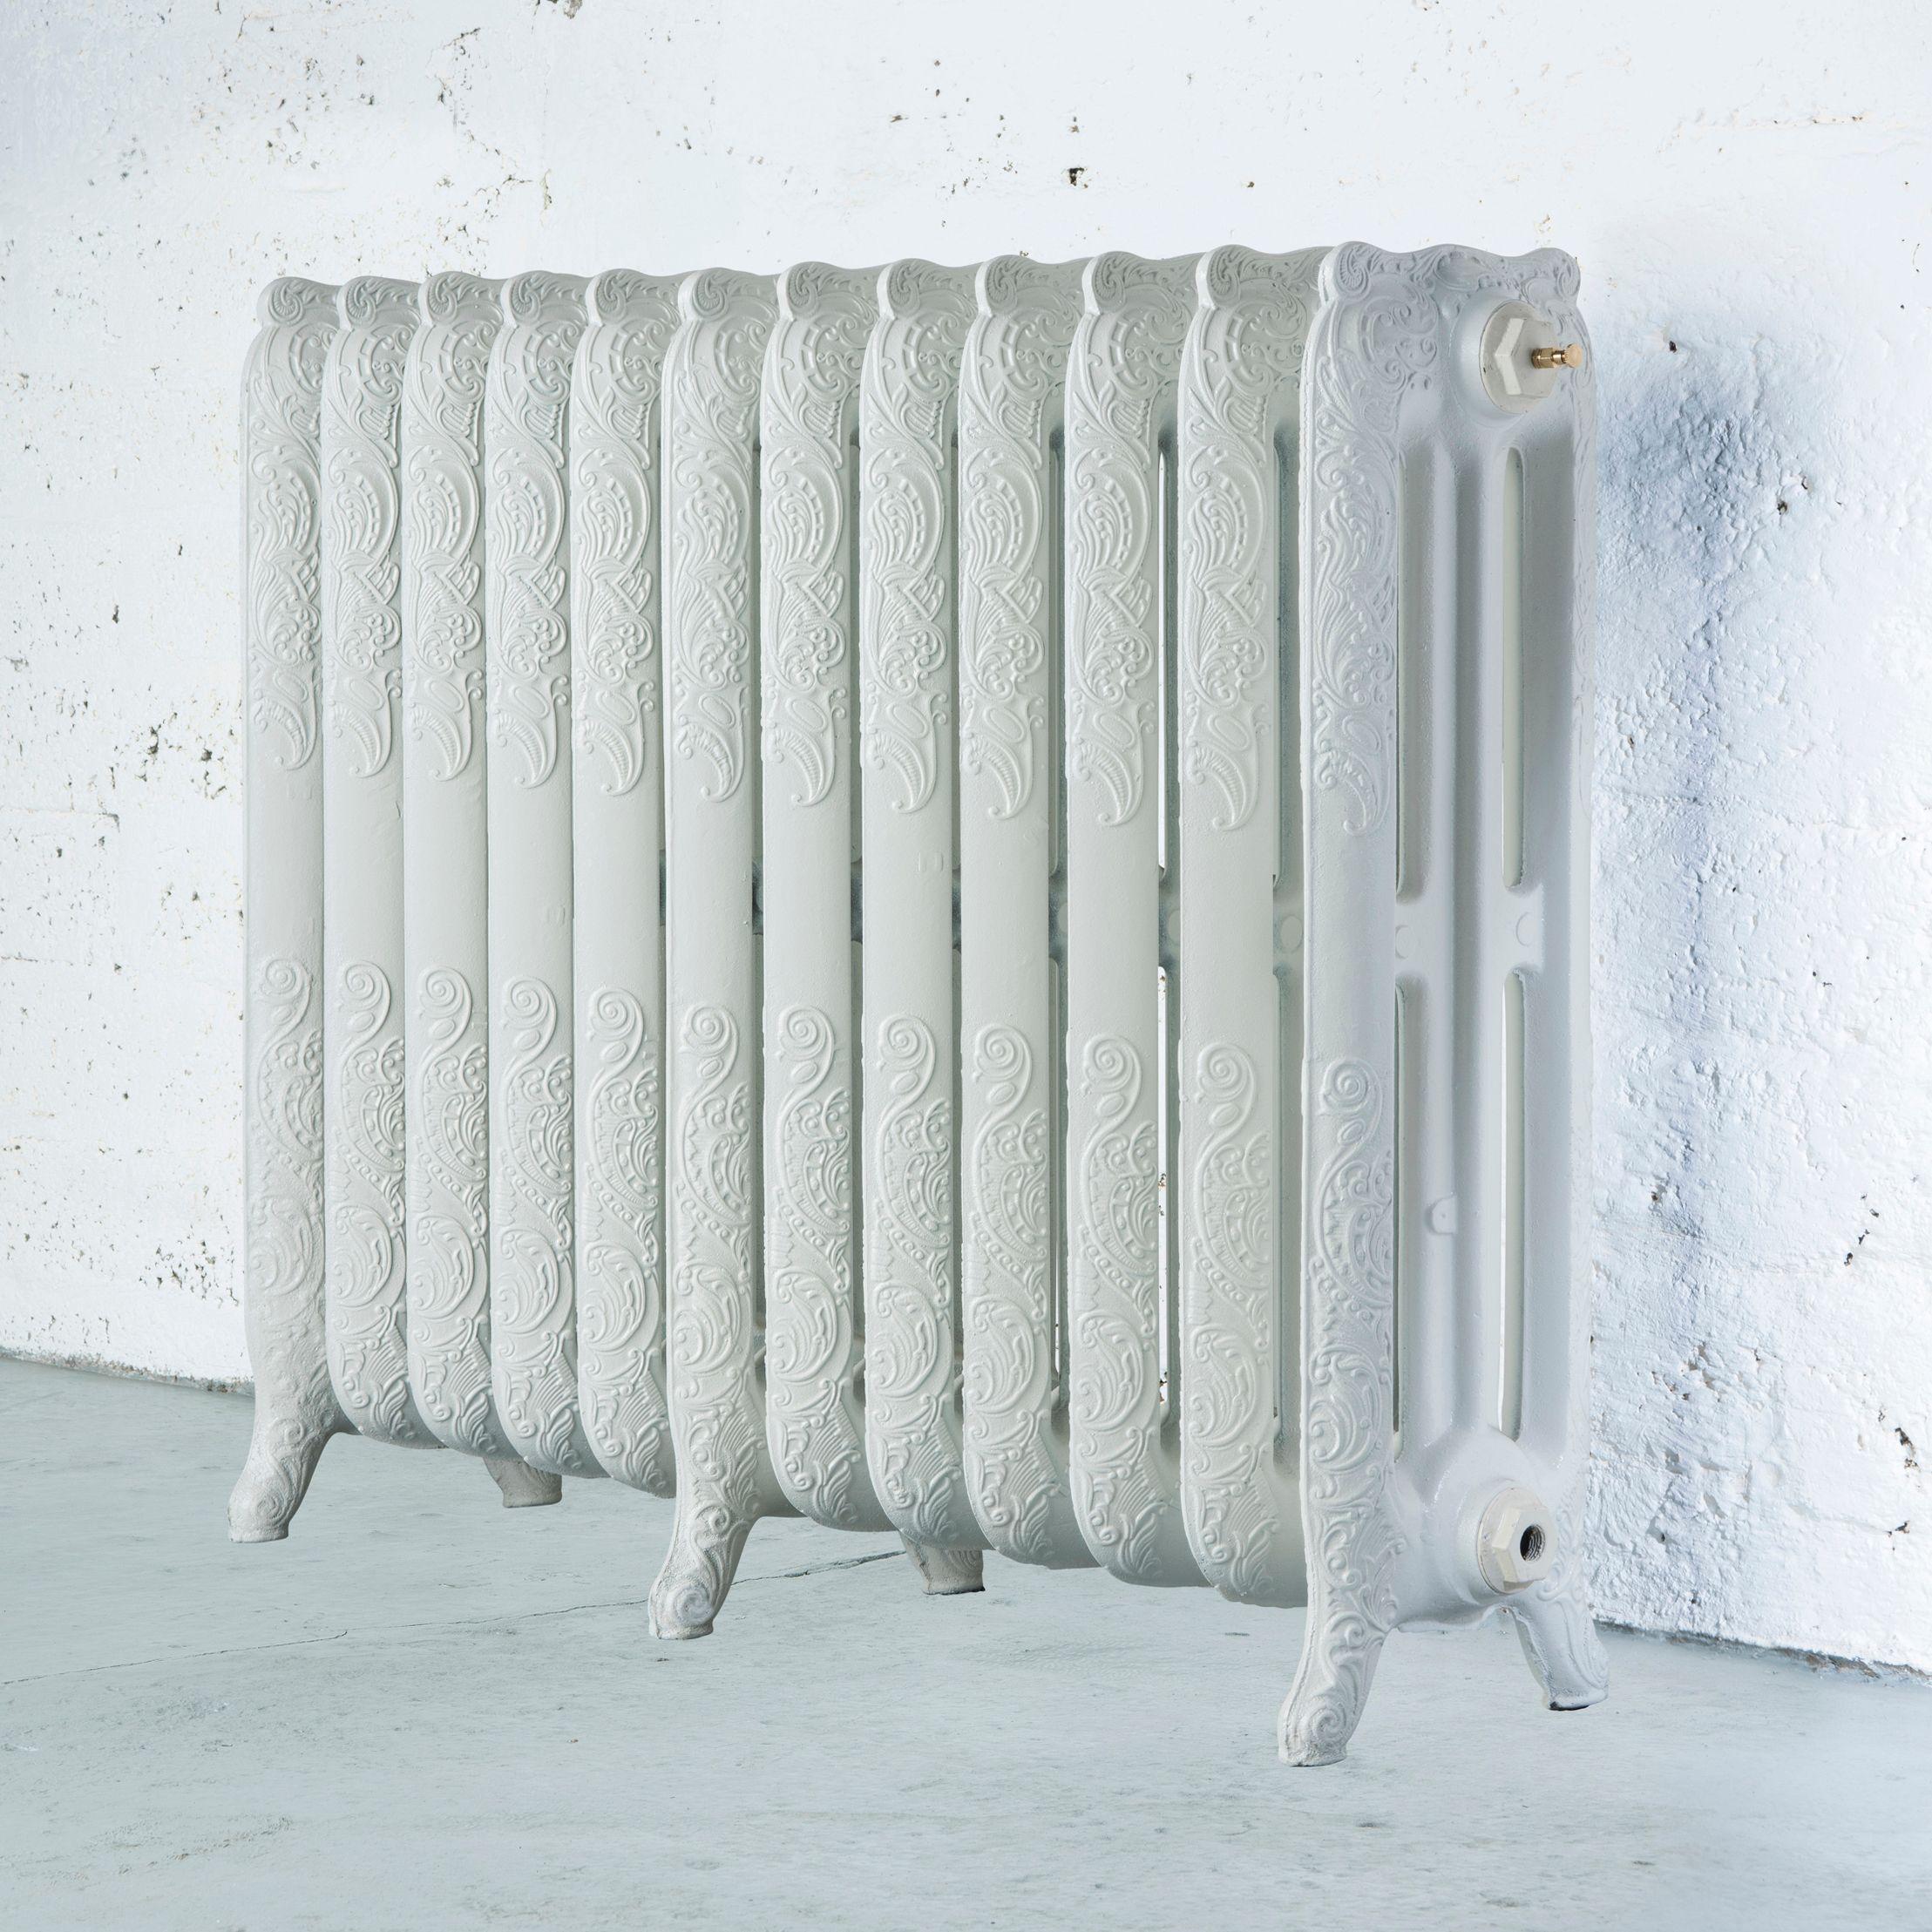 Arroll Montmartre 3 Column radiator, White (W)994mm (H)760mm